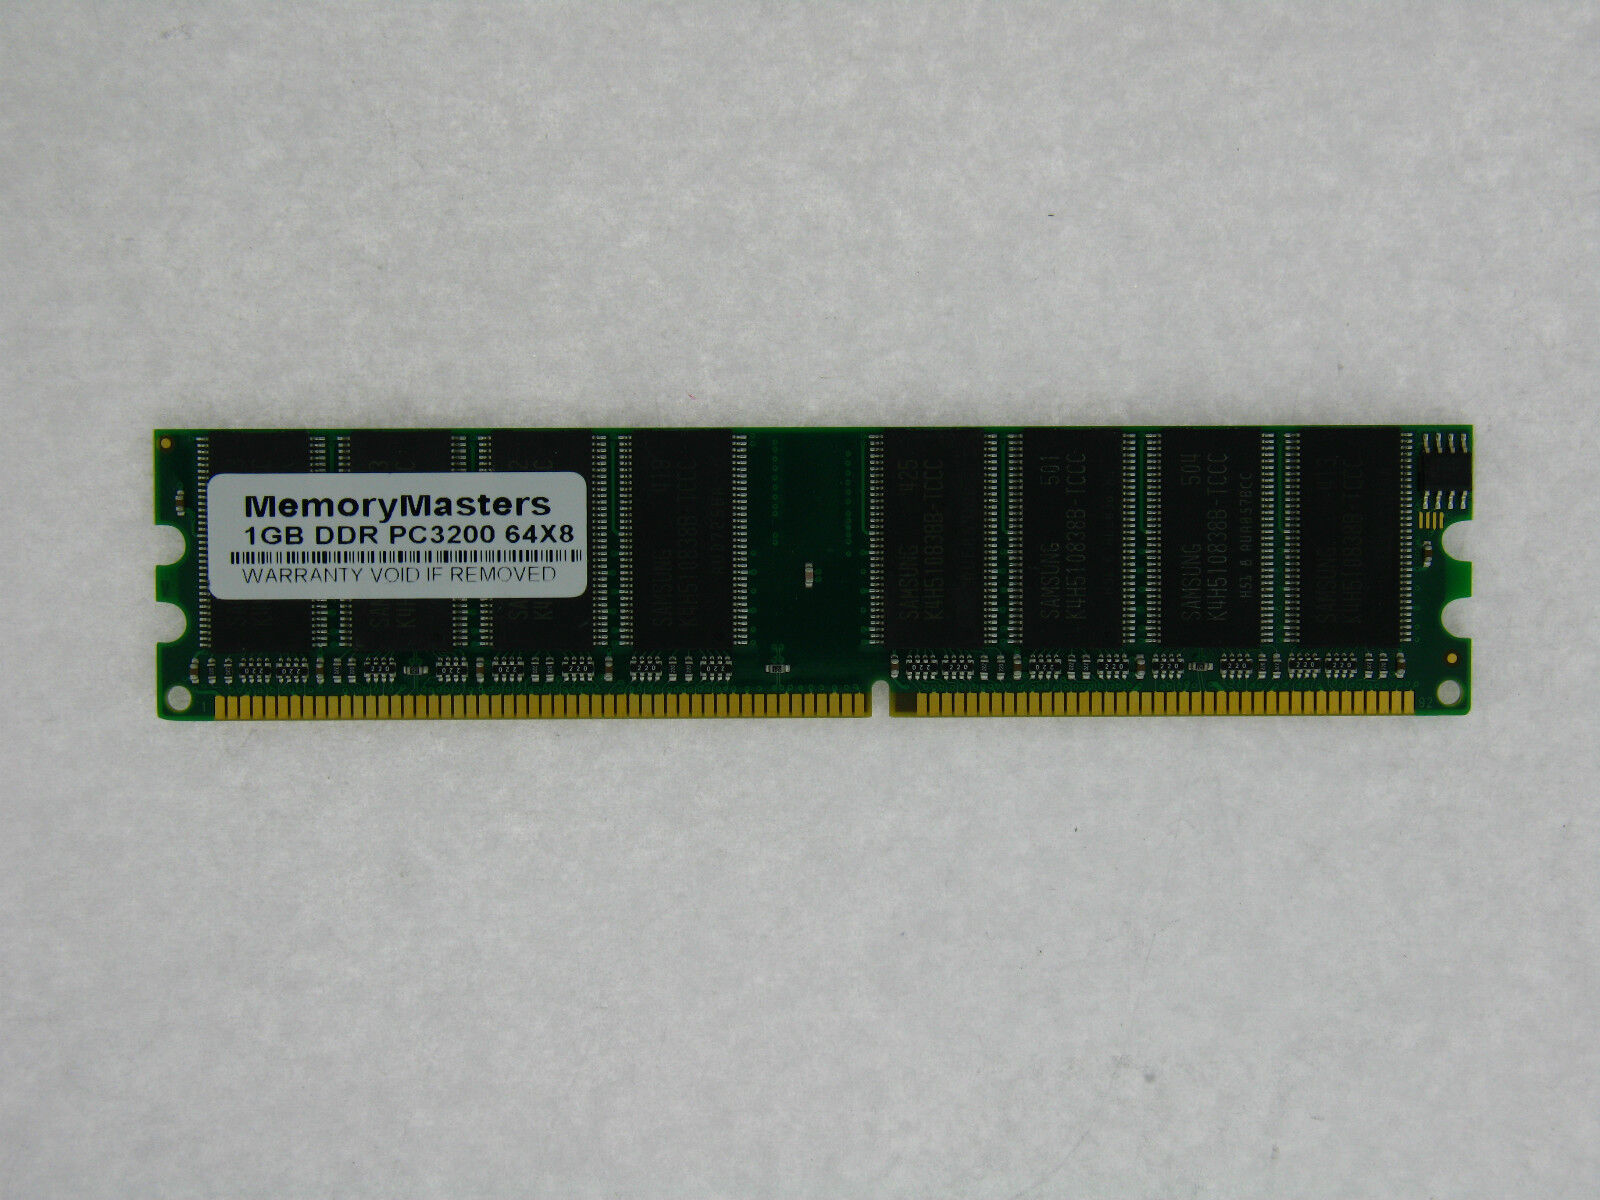 LOT OF TEN 1GB DDR3 MEMORY RAM PC3-6400 NON-ECC DIMM